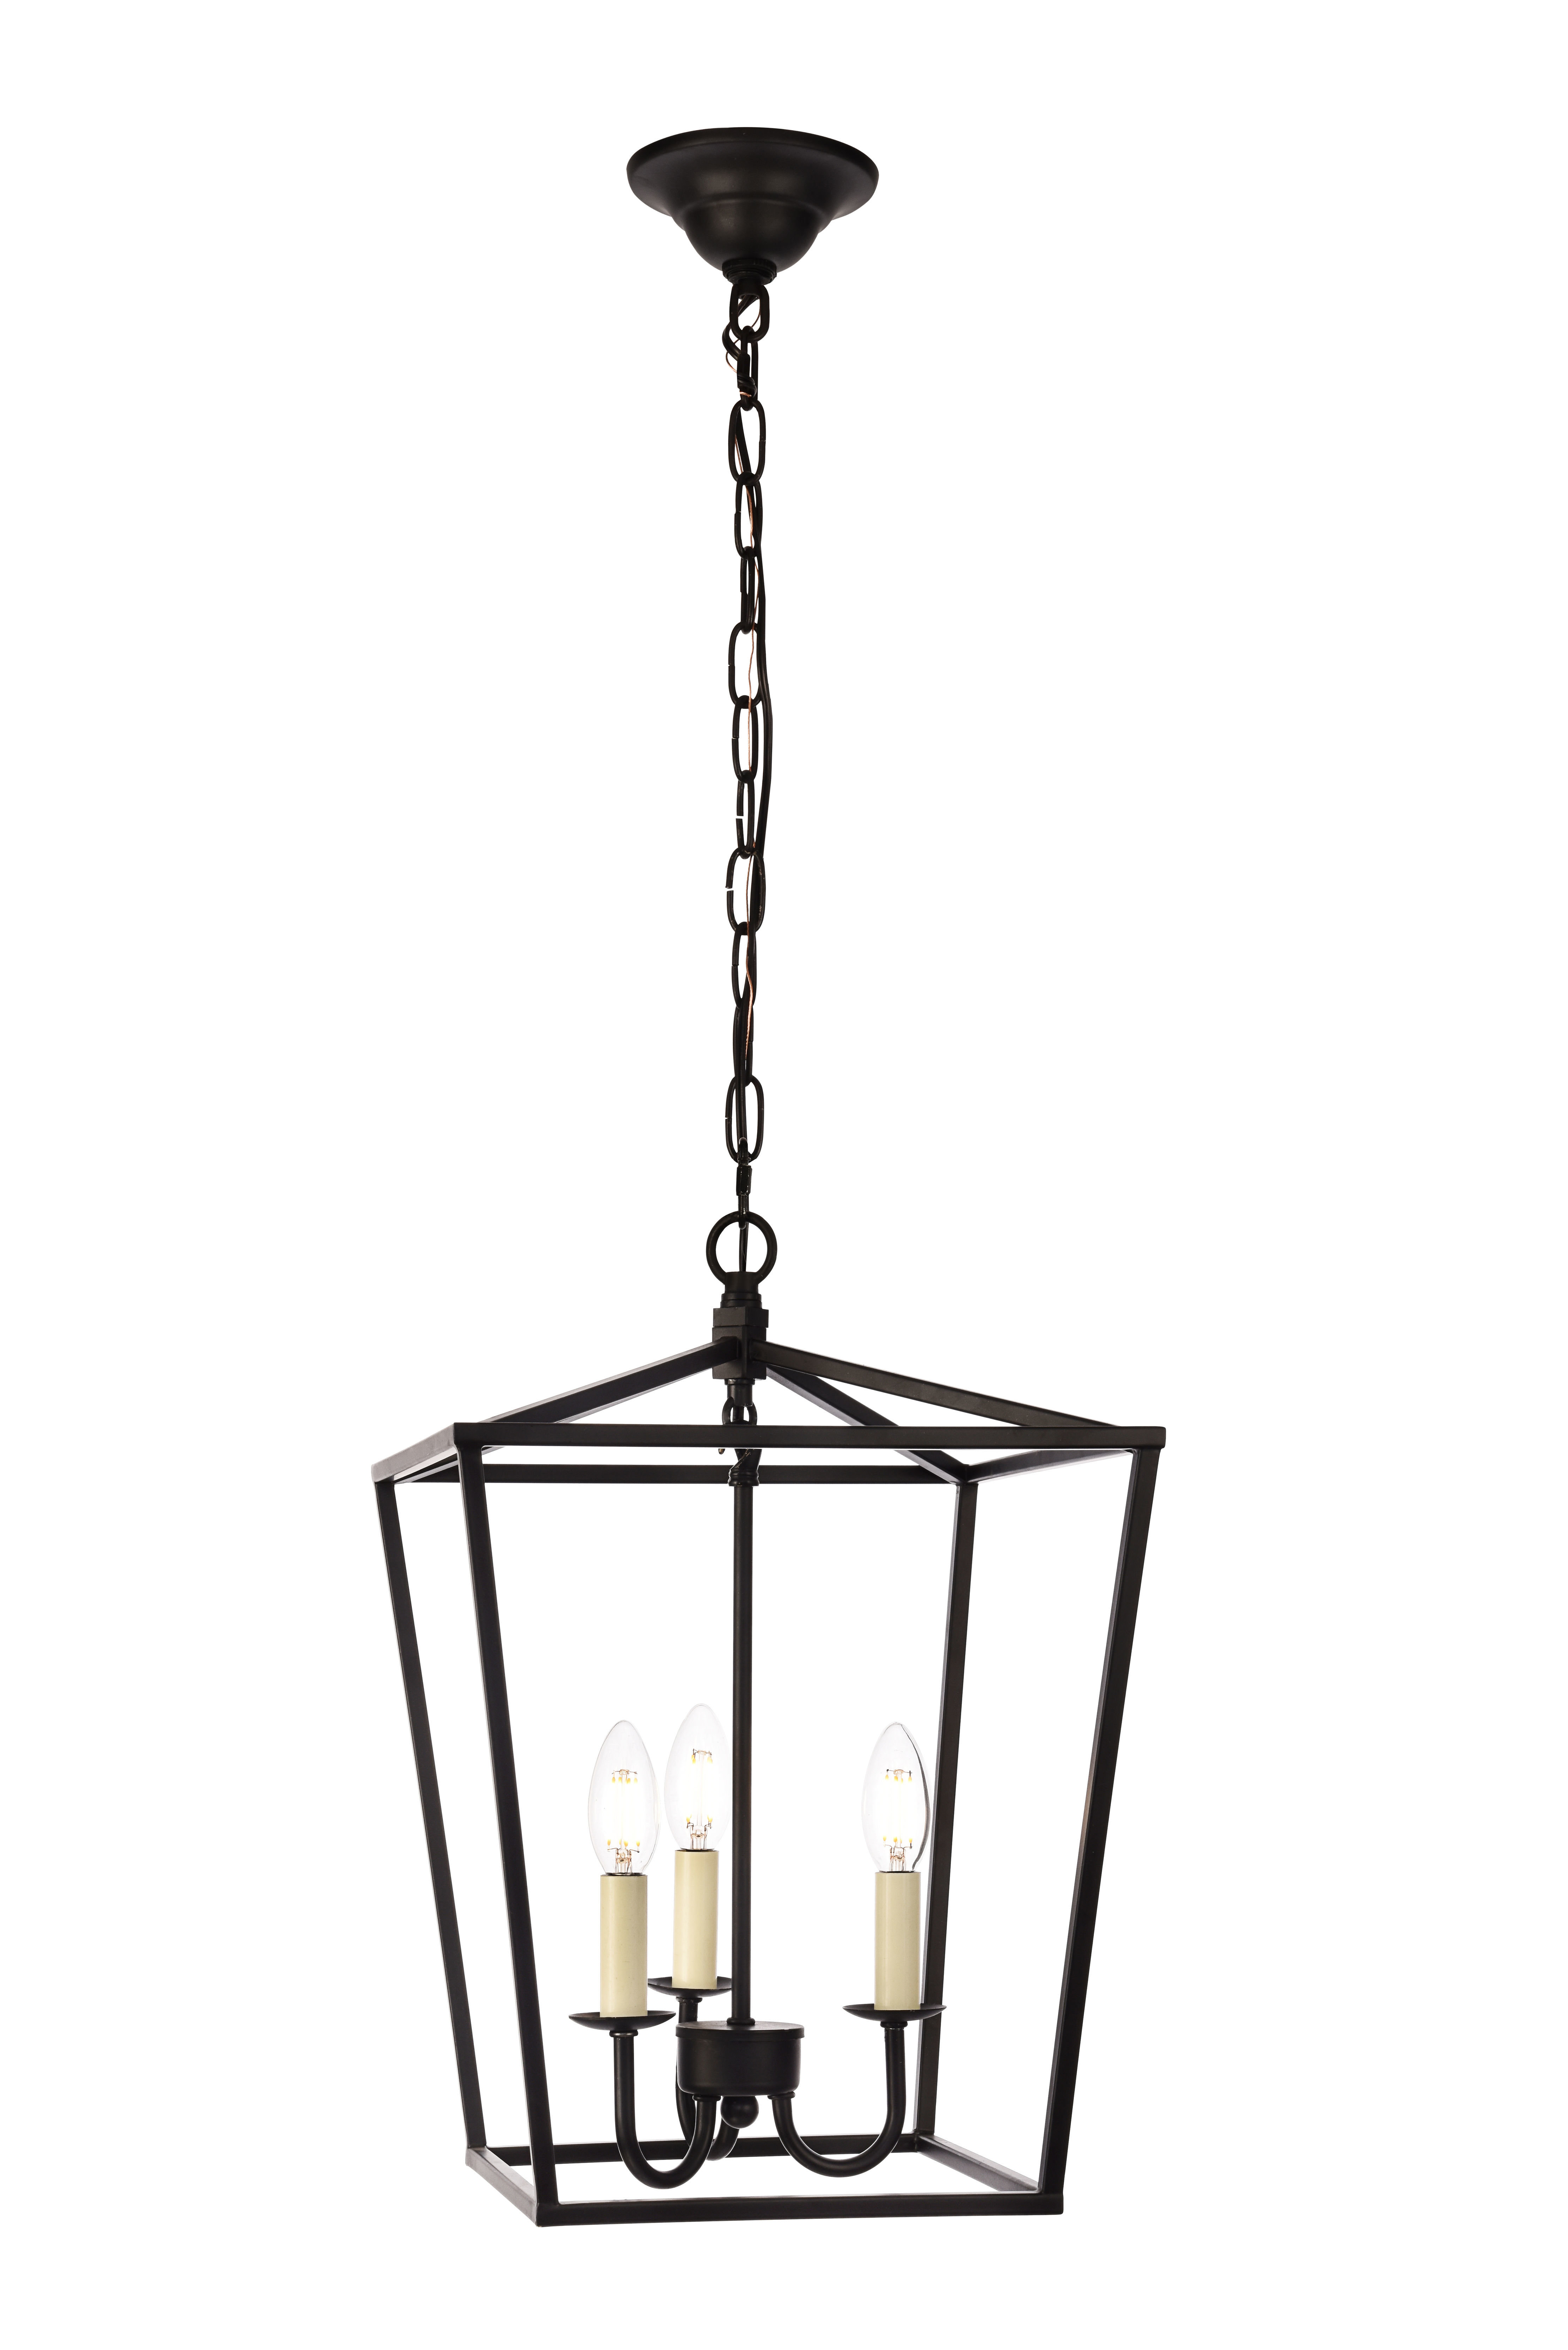 Newest Finnick 3 Light Lantern Pendant Intended For Destrey 3 Light Lantern Square/rectangle Pendants (Gallery 14 of 20)